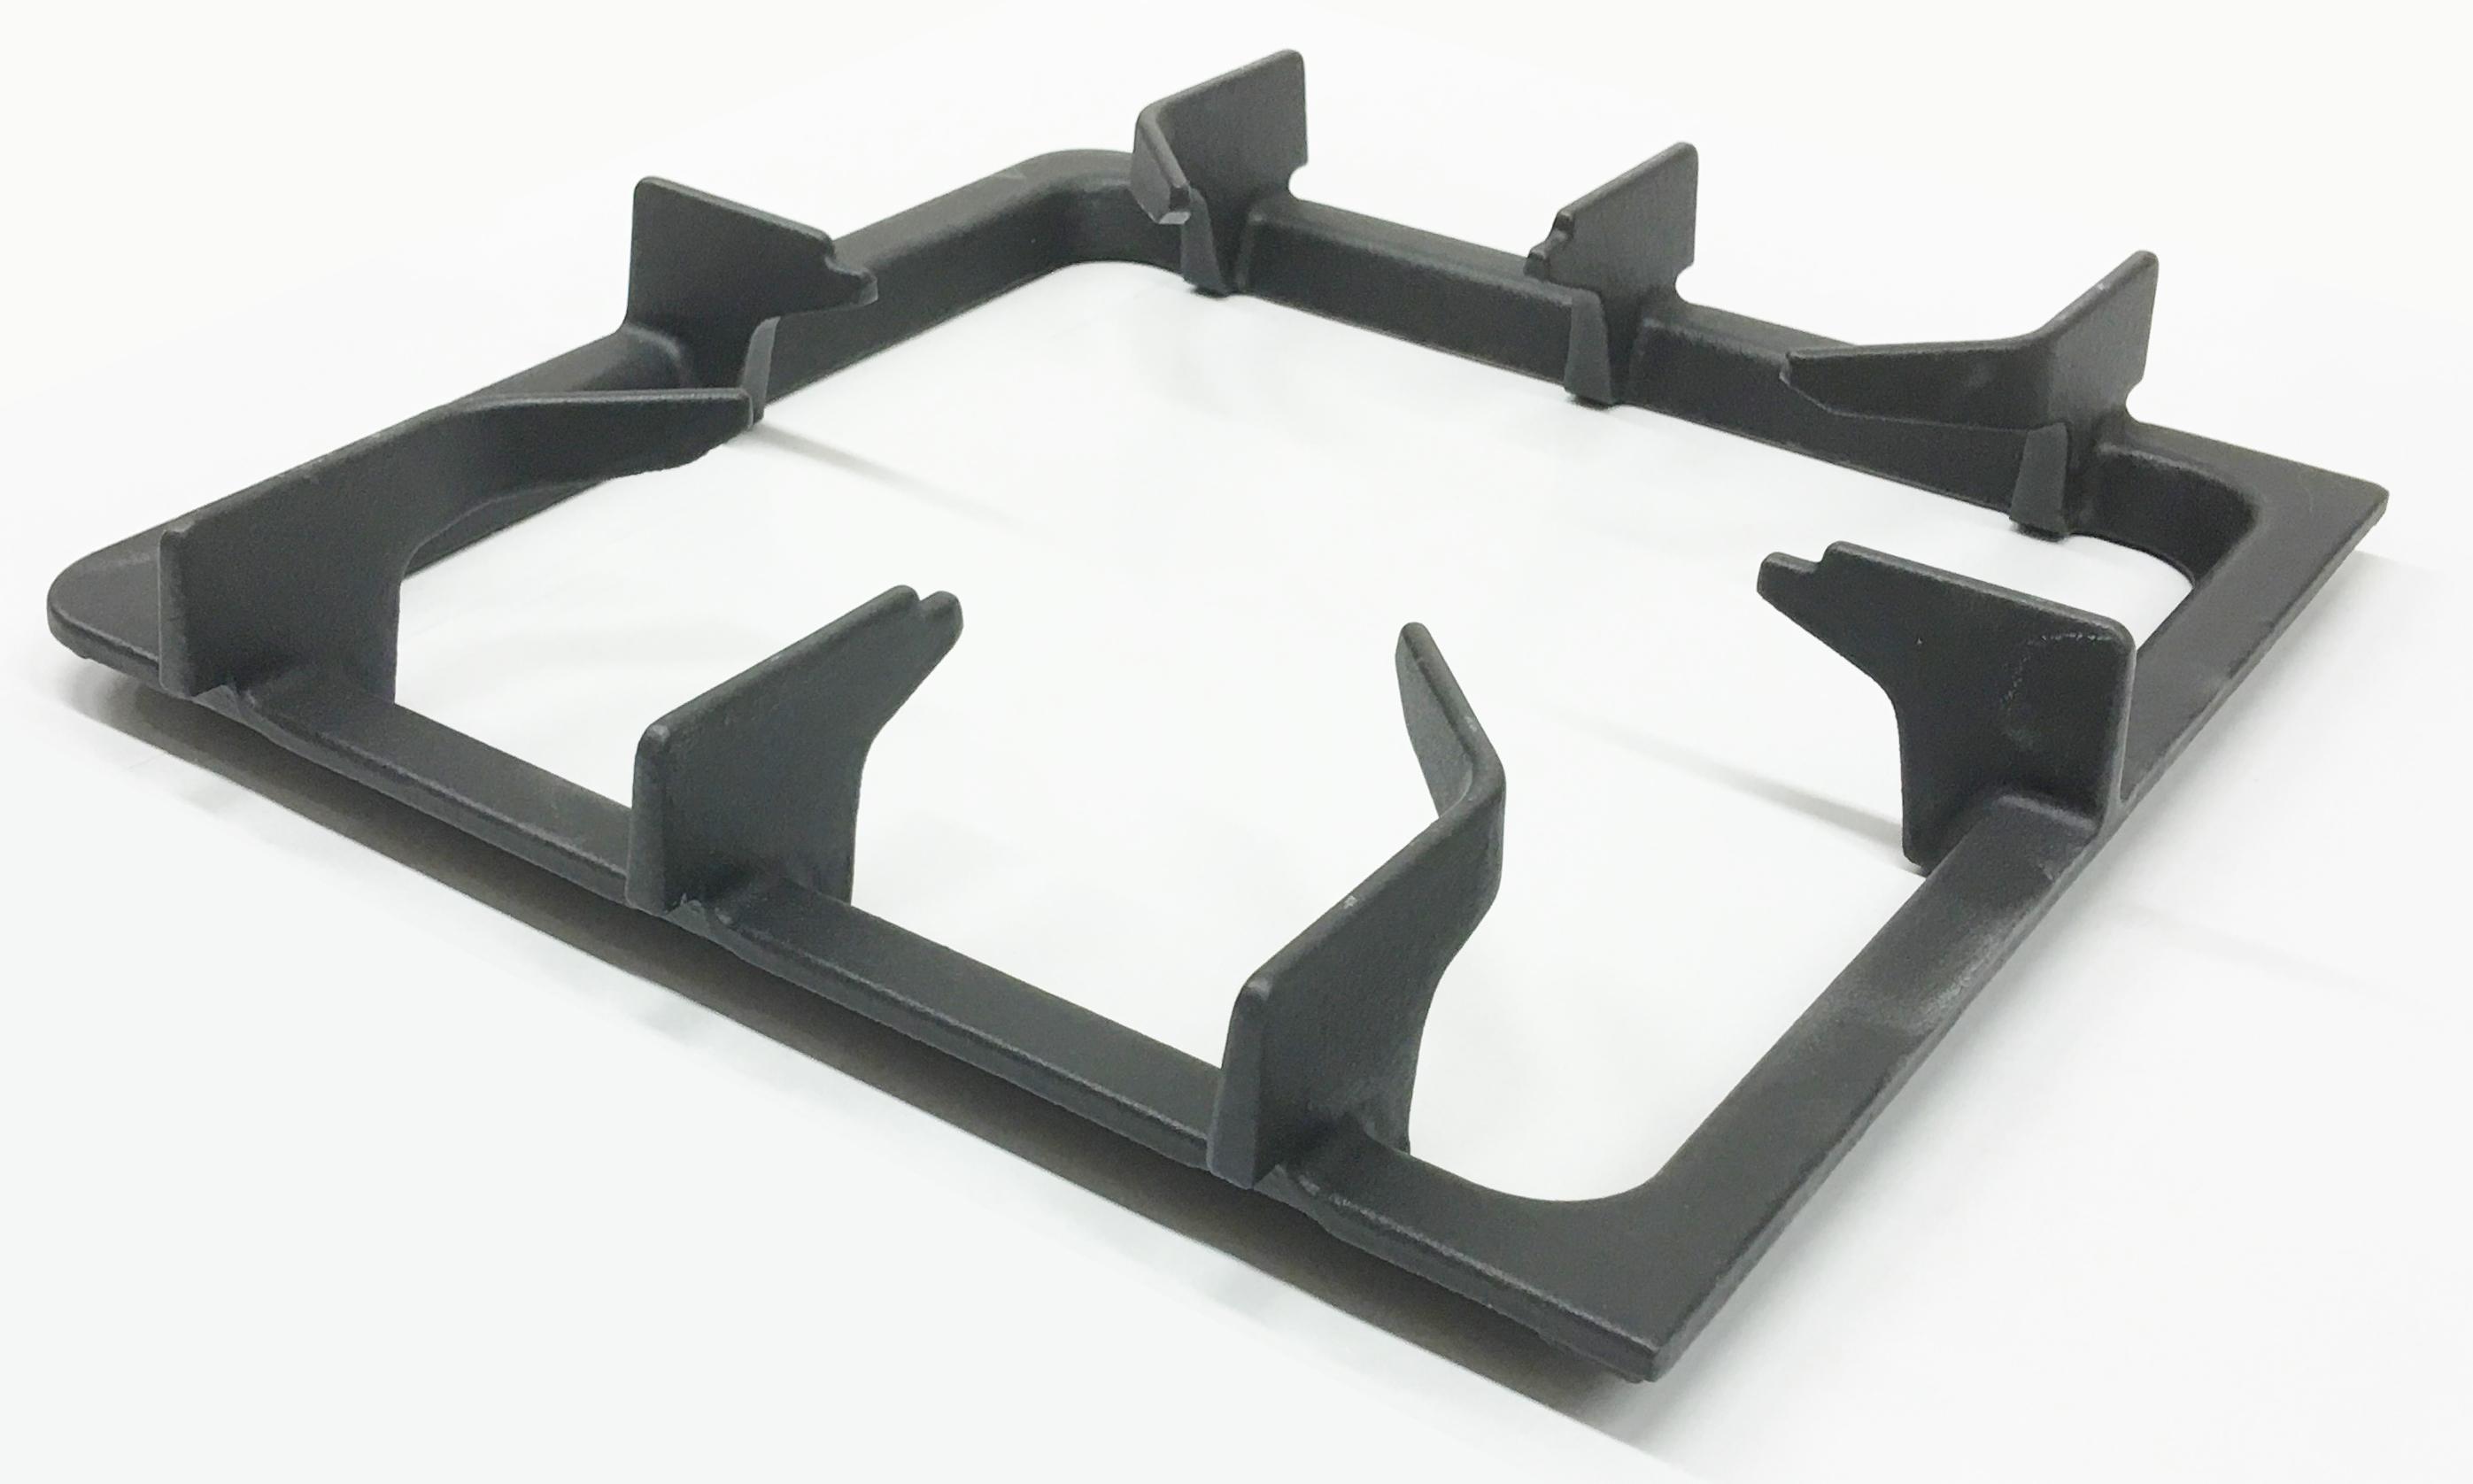 sergioshop rost f r angelo po gasherd 315x315 mm. Black Bedroom Furniture Sets. Home Design Ideas